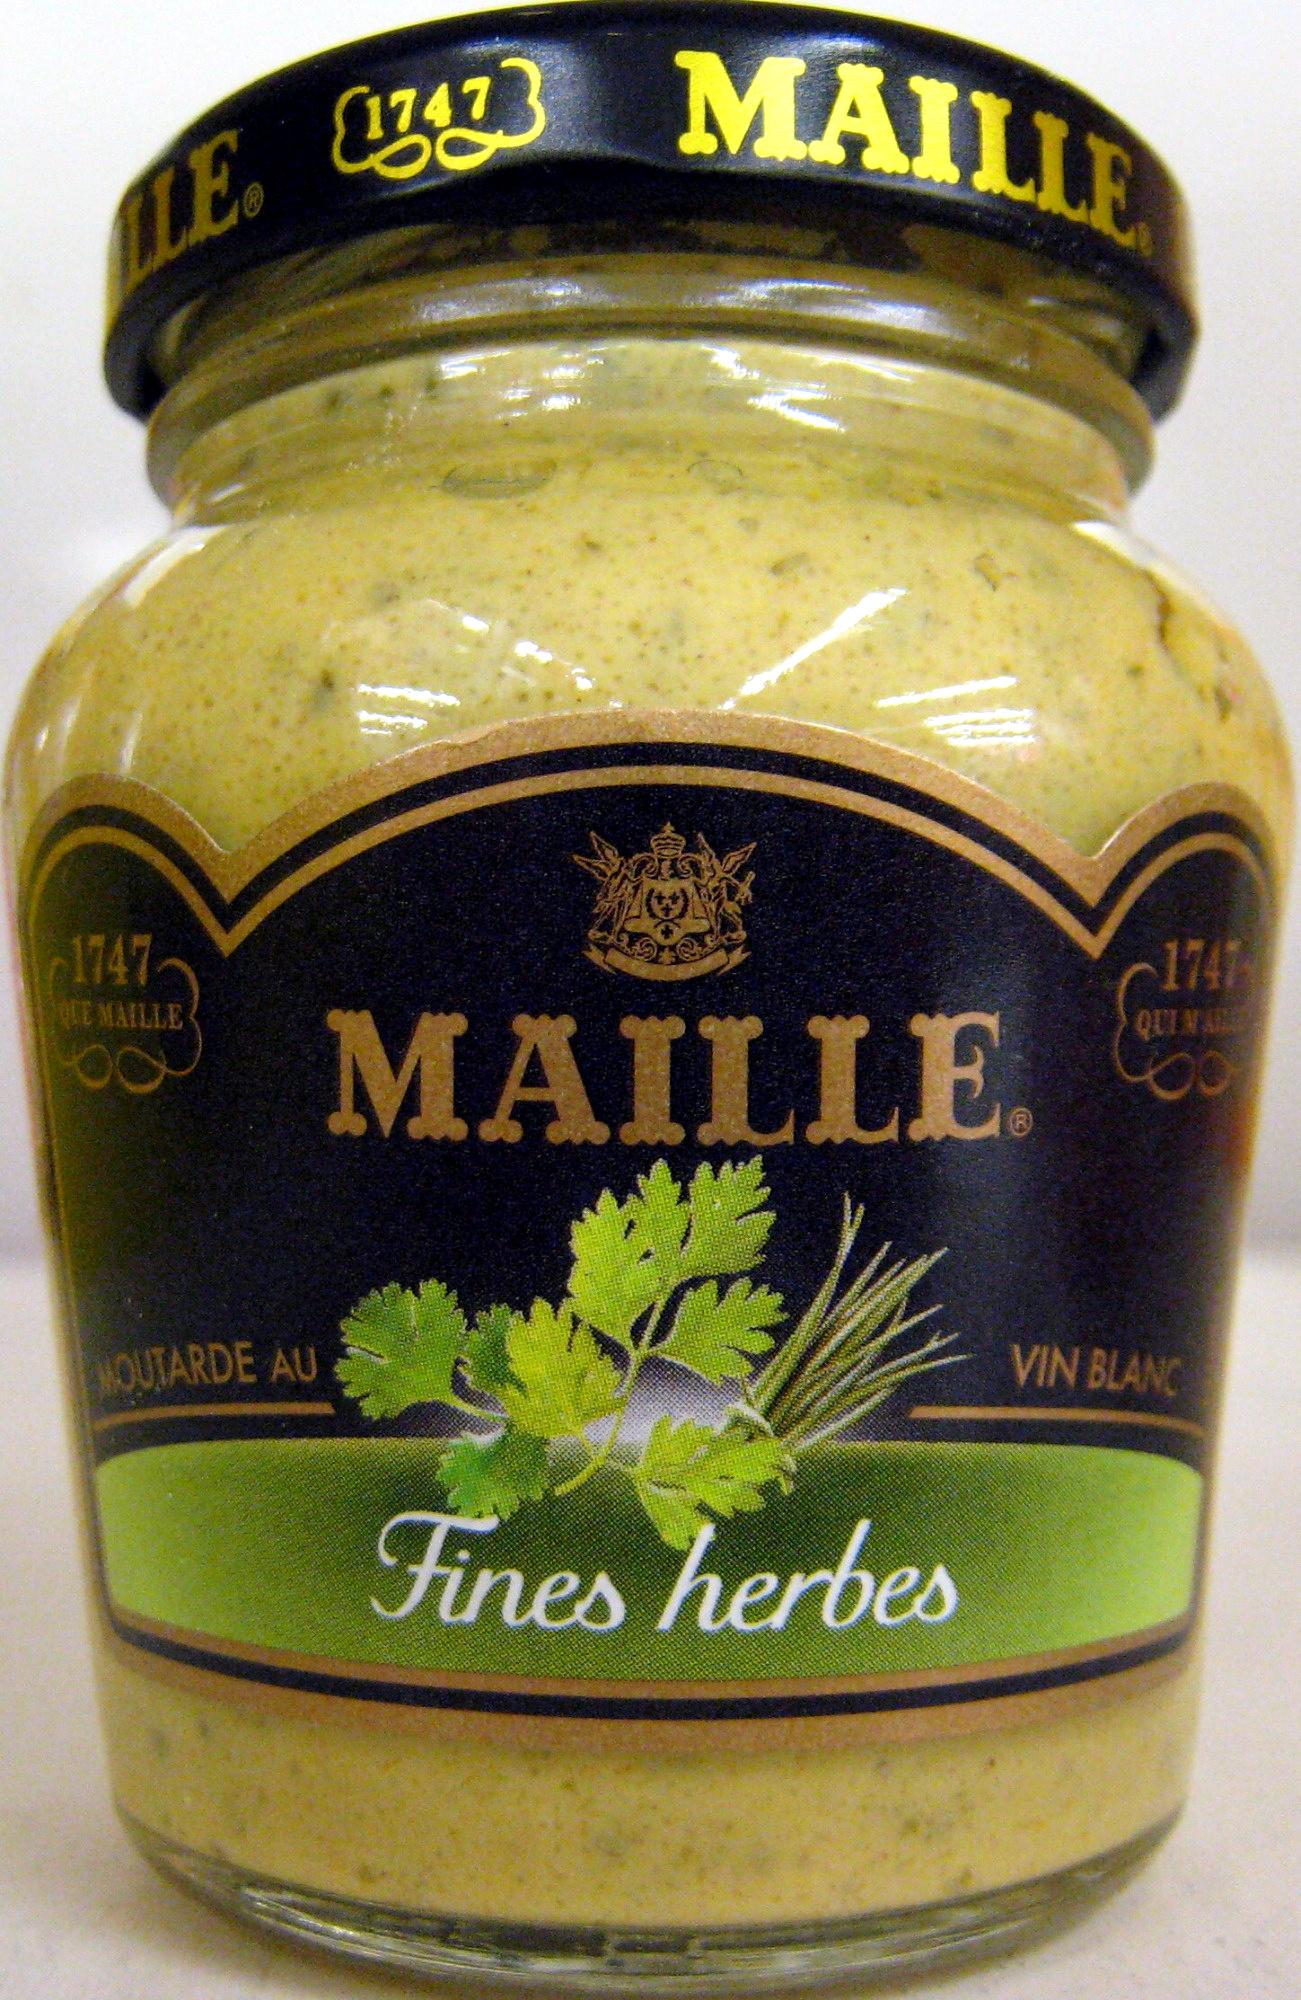 moutarde au vin blanc aux fines herbes maille 108 g. Black Bedroom Furniture Sets. Home Design Ideas